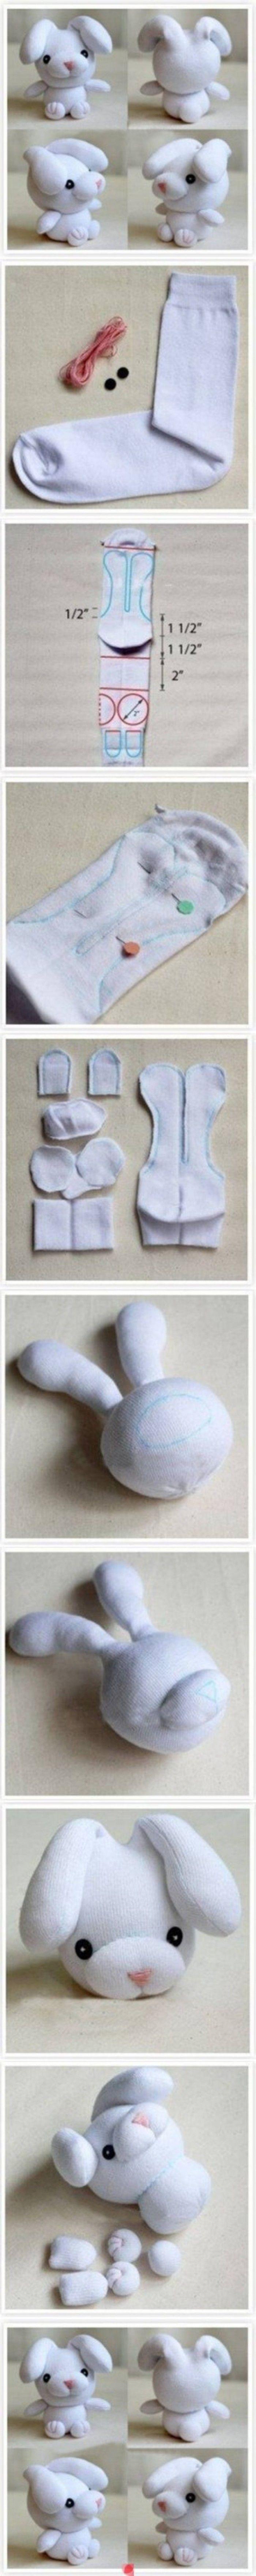 Soft doll  ... ♥ Deniz ♥